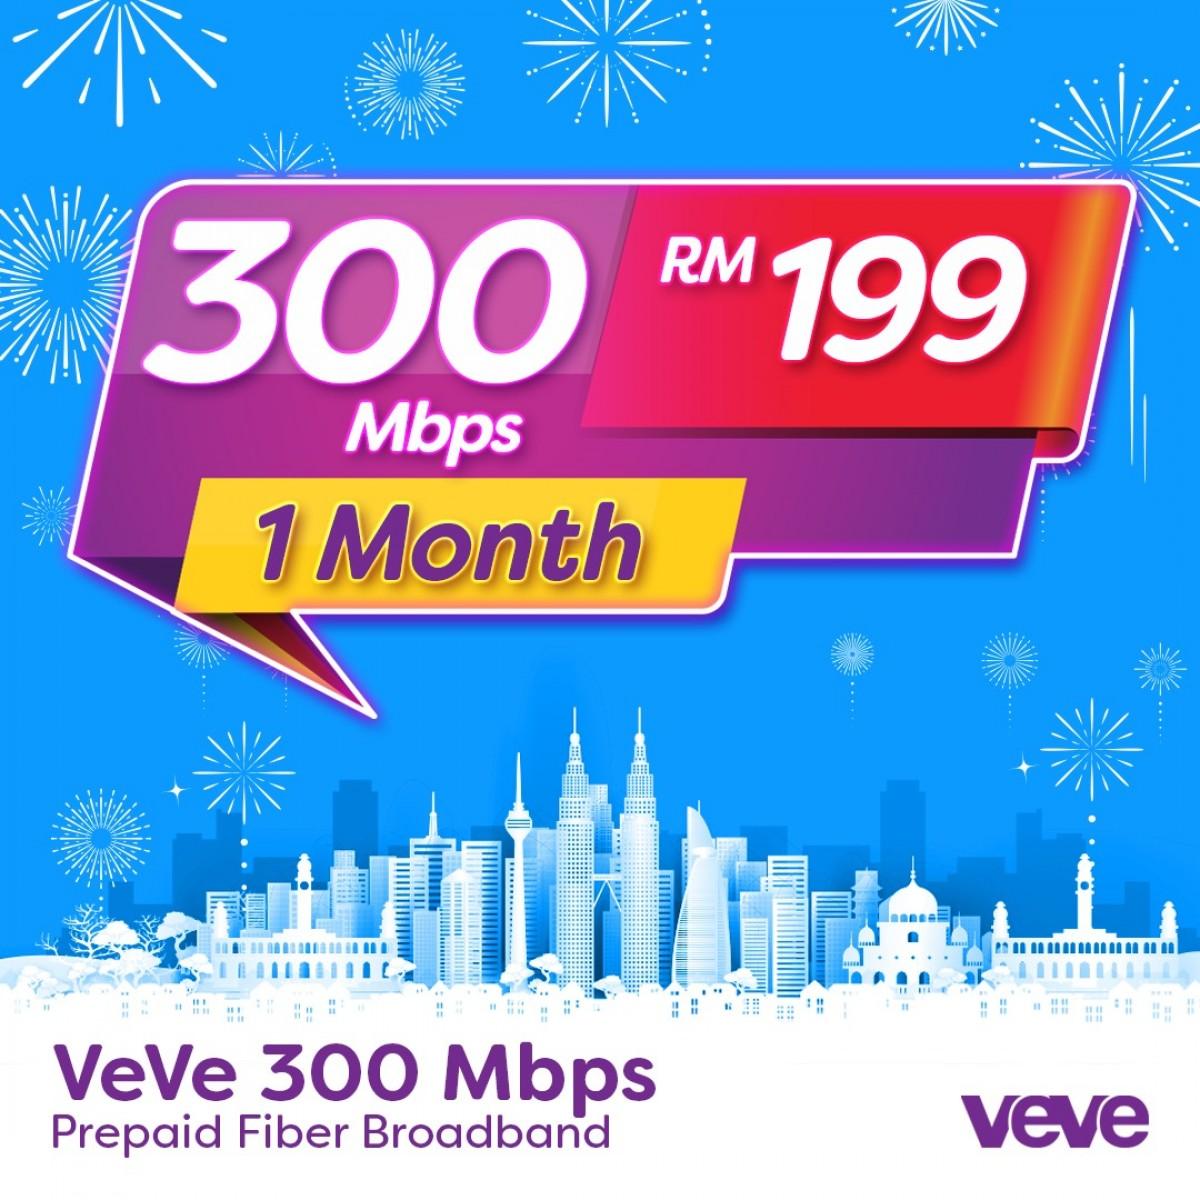 VEVE 300 Mbps Home Fibre (1 Months) - VEVE